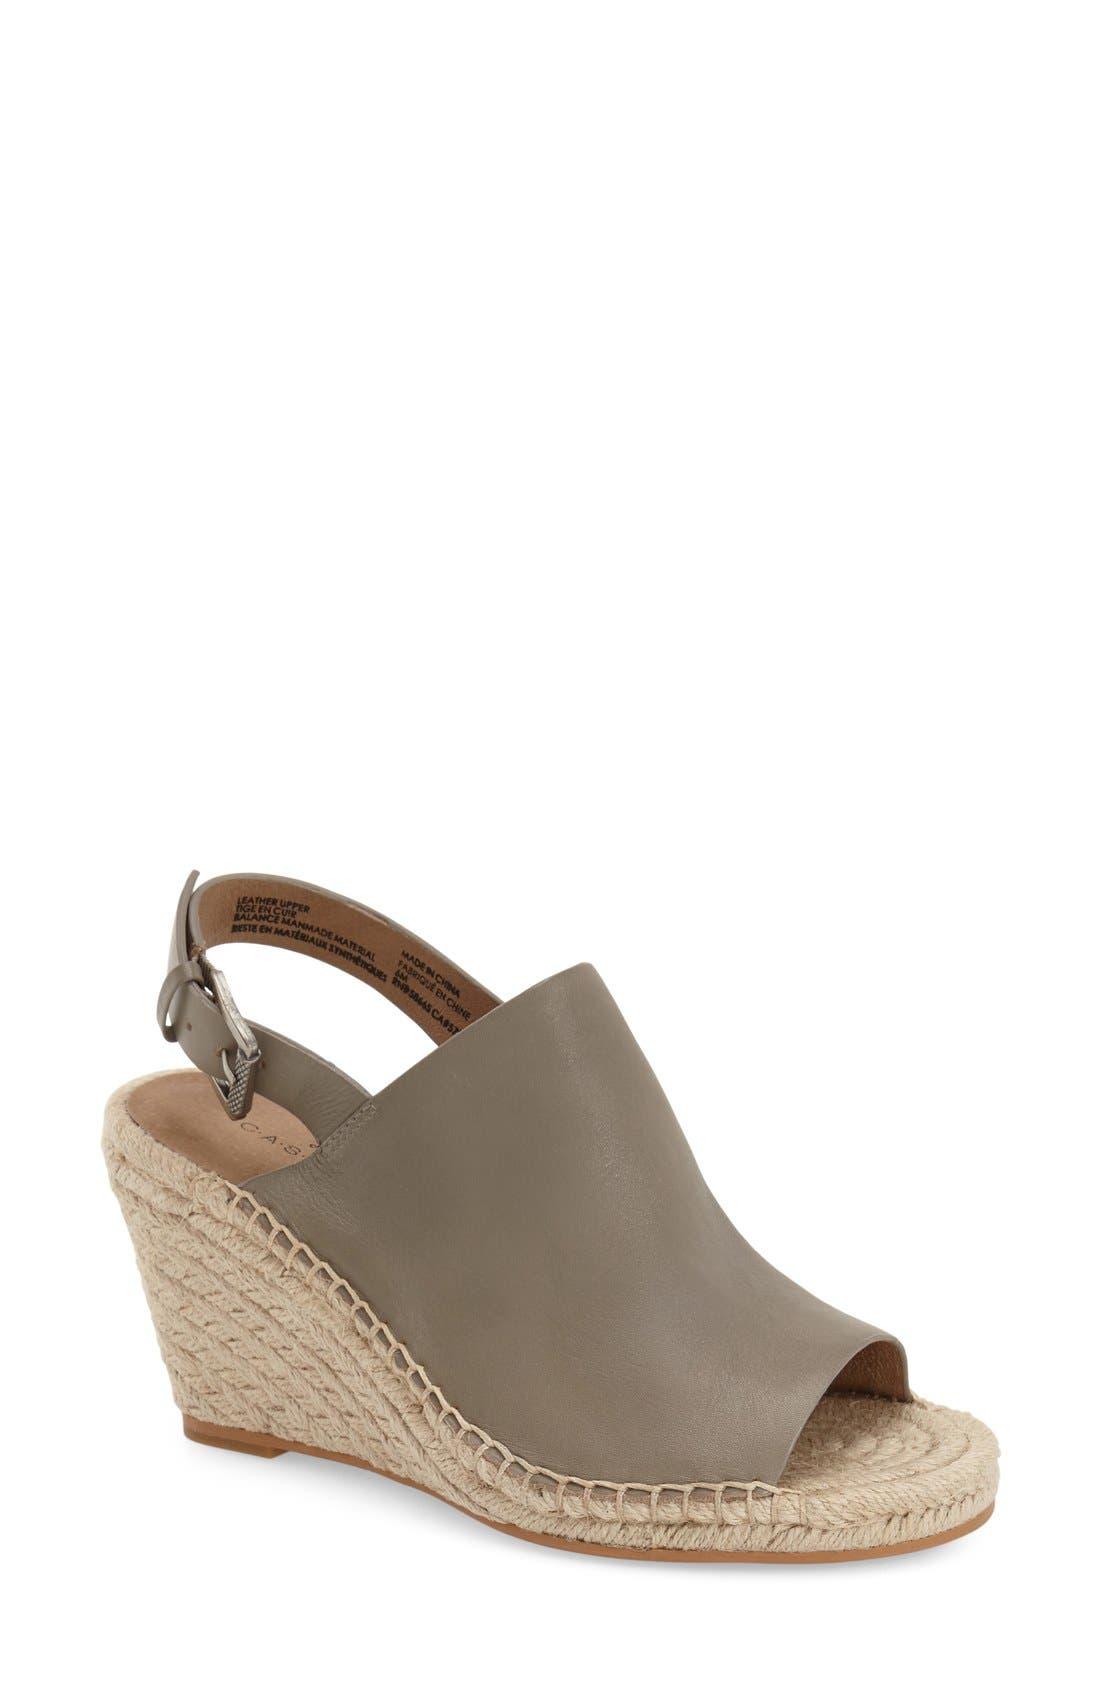 Main Image - Caslon® Sutton Slingback Sandal (Women)